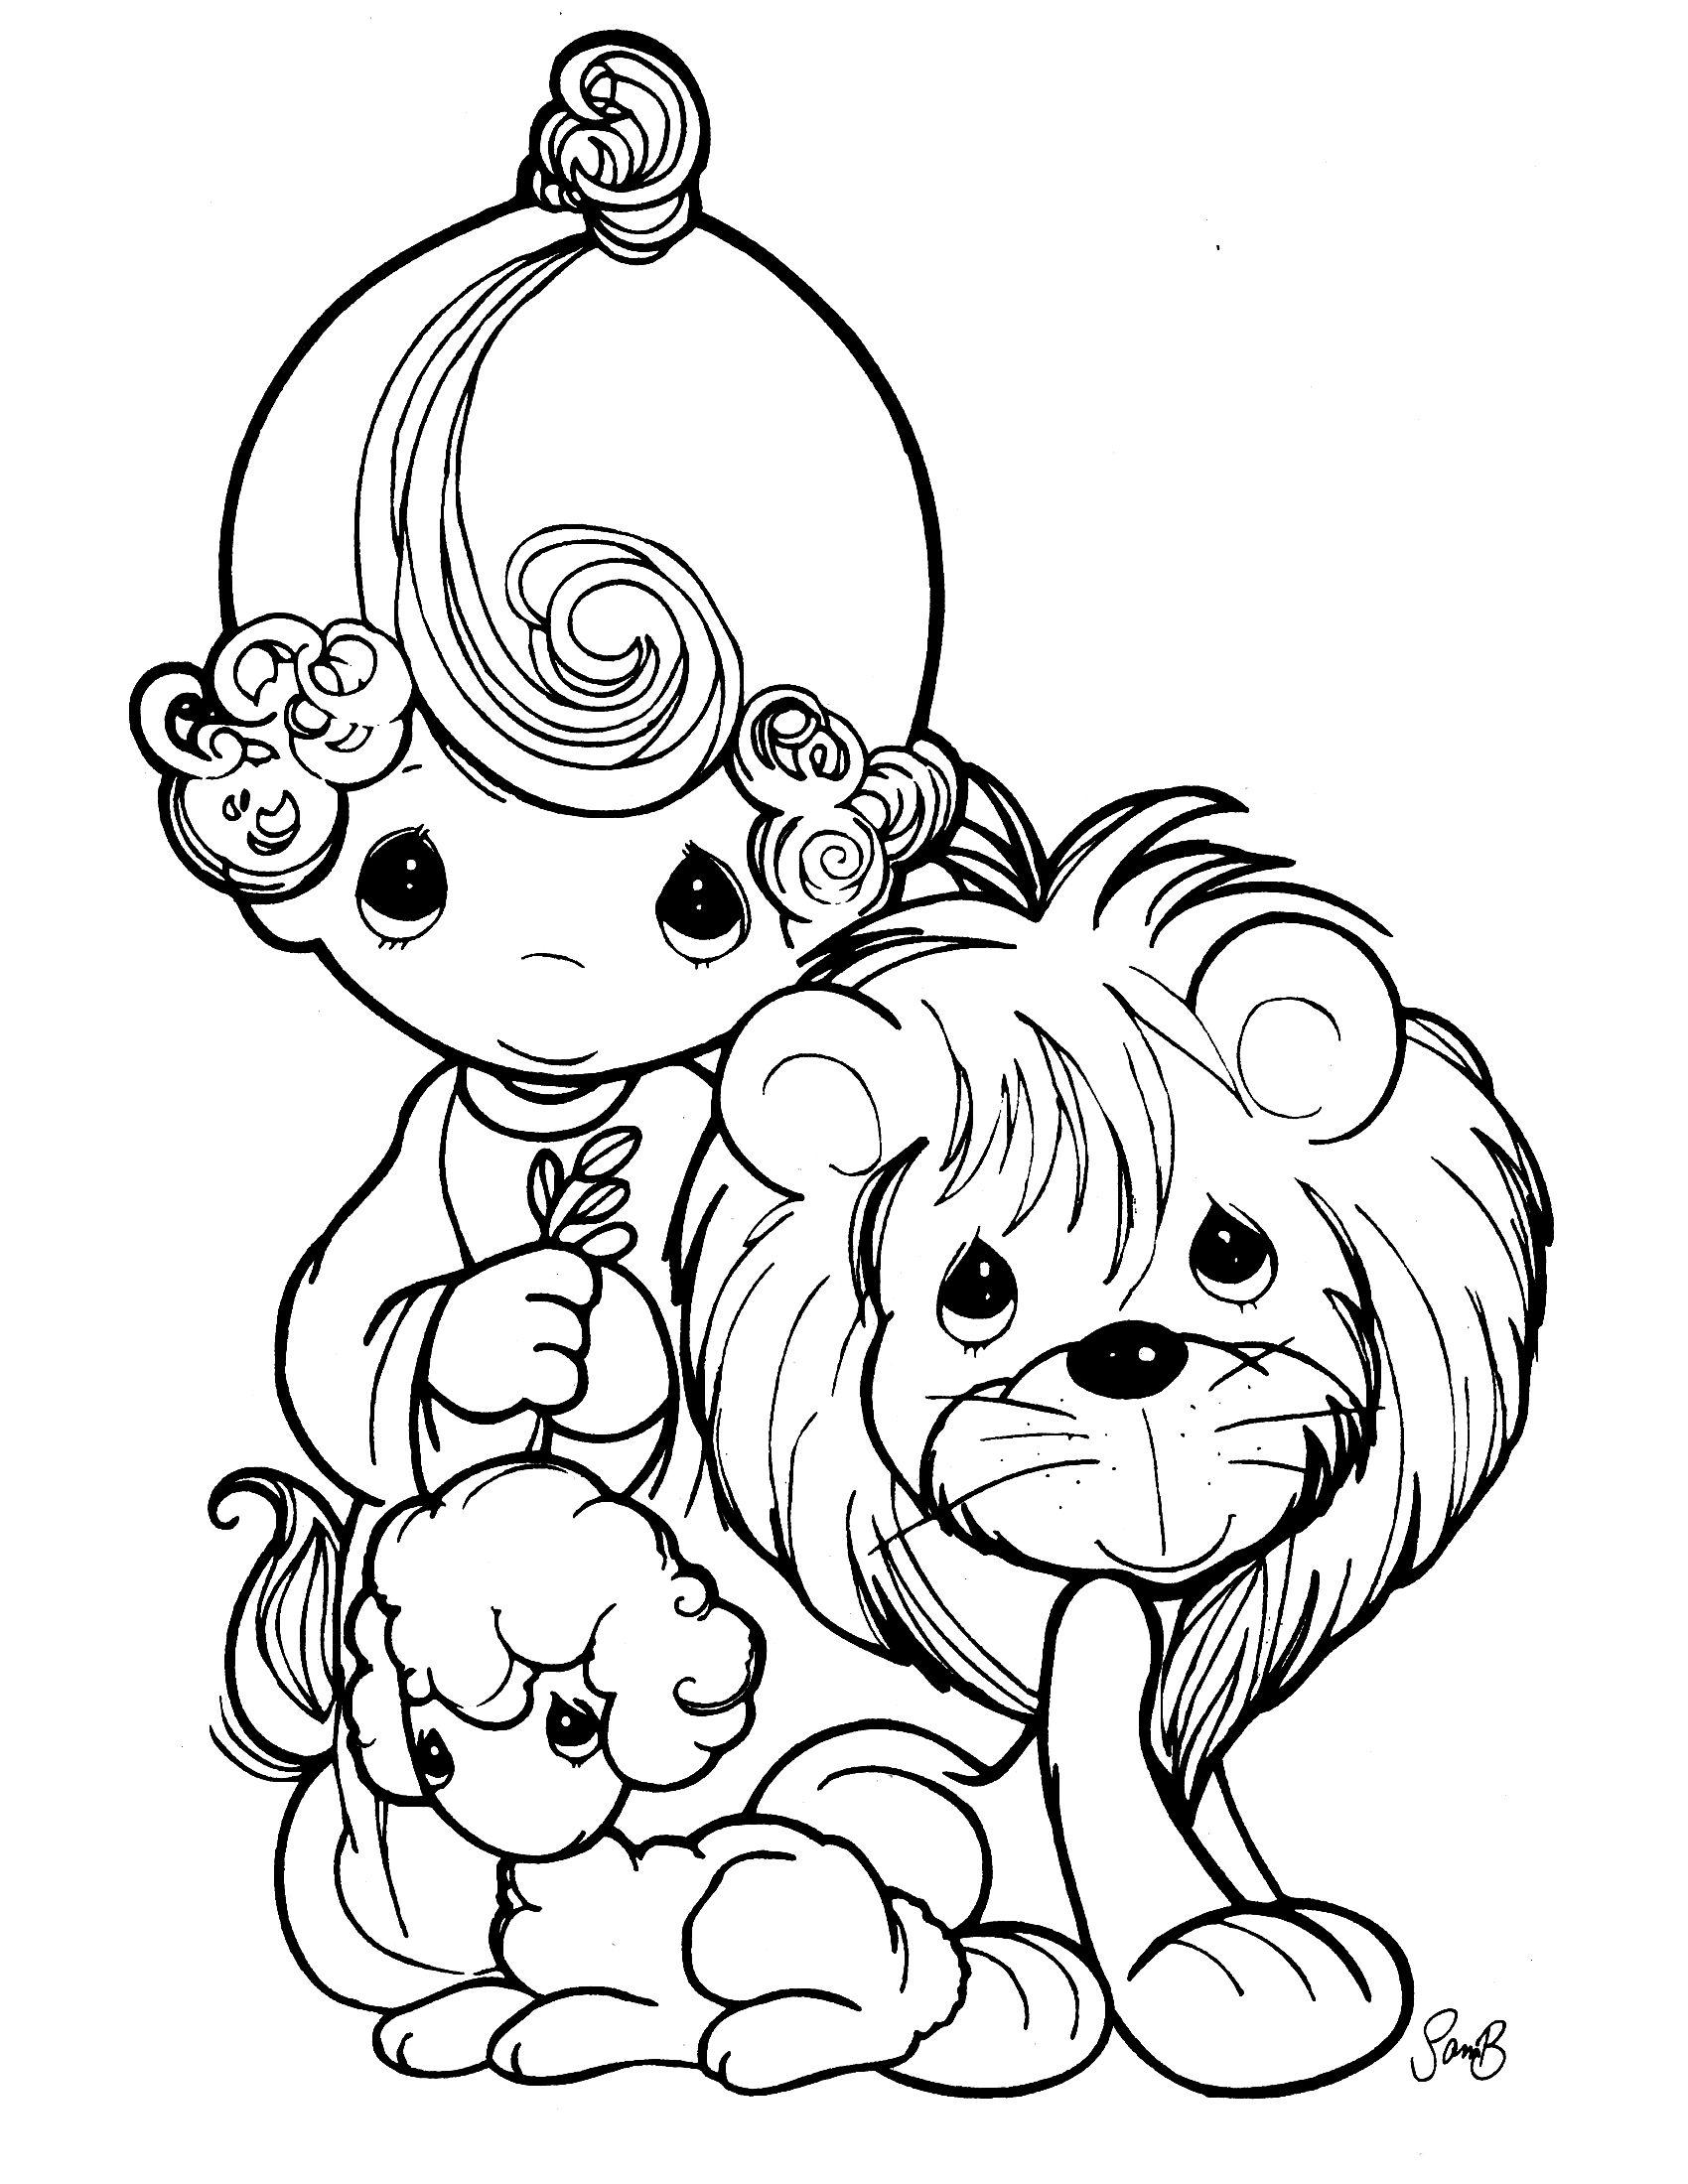 Precious Moments 5 Precious Moments Coloring Pages Lion Coloring Pages Coloring Books